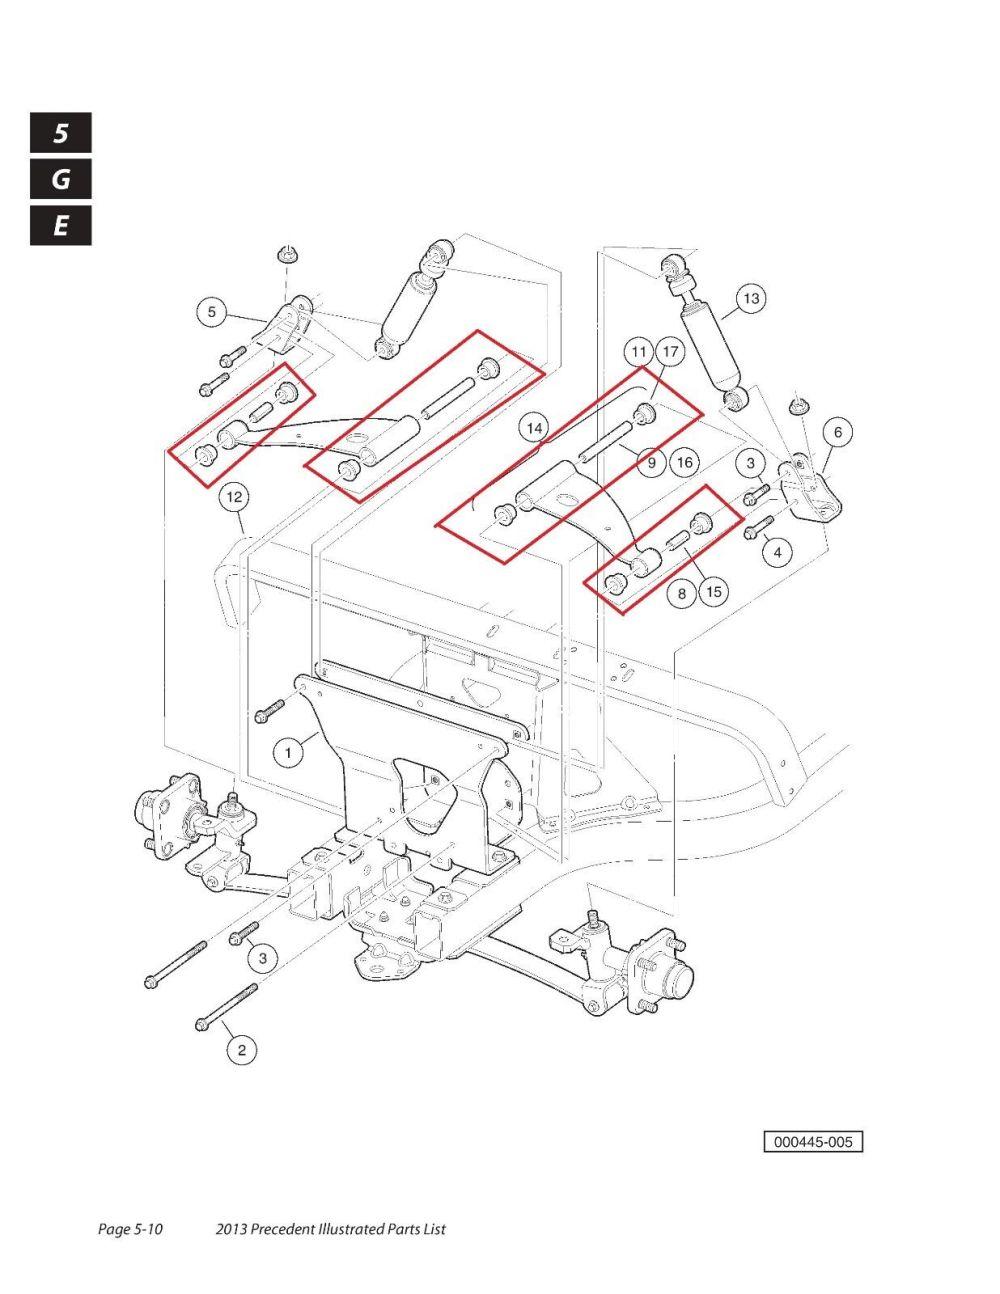 medium resolution of 1993 ga club car part diagram